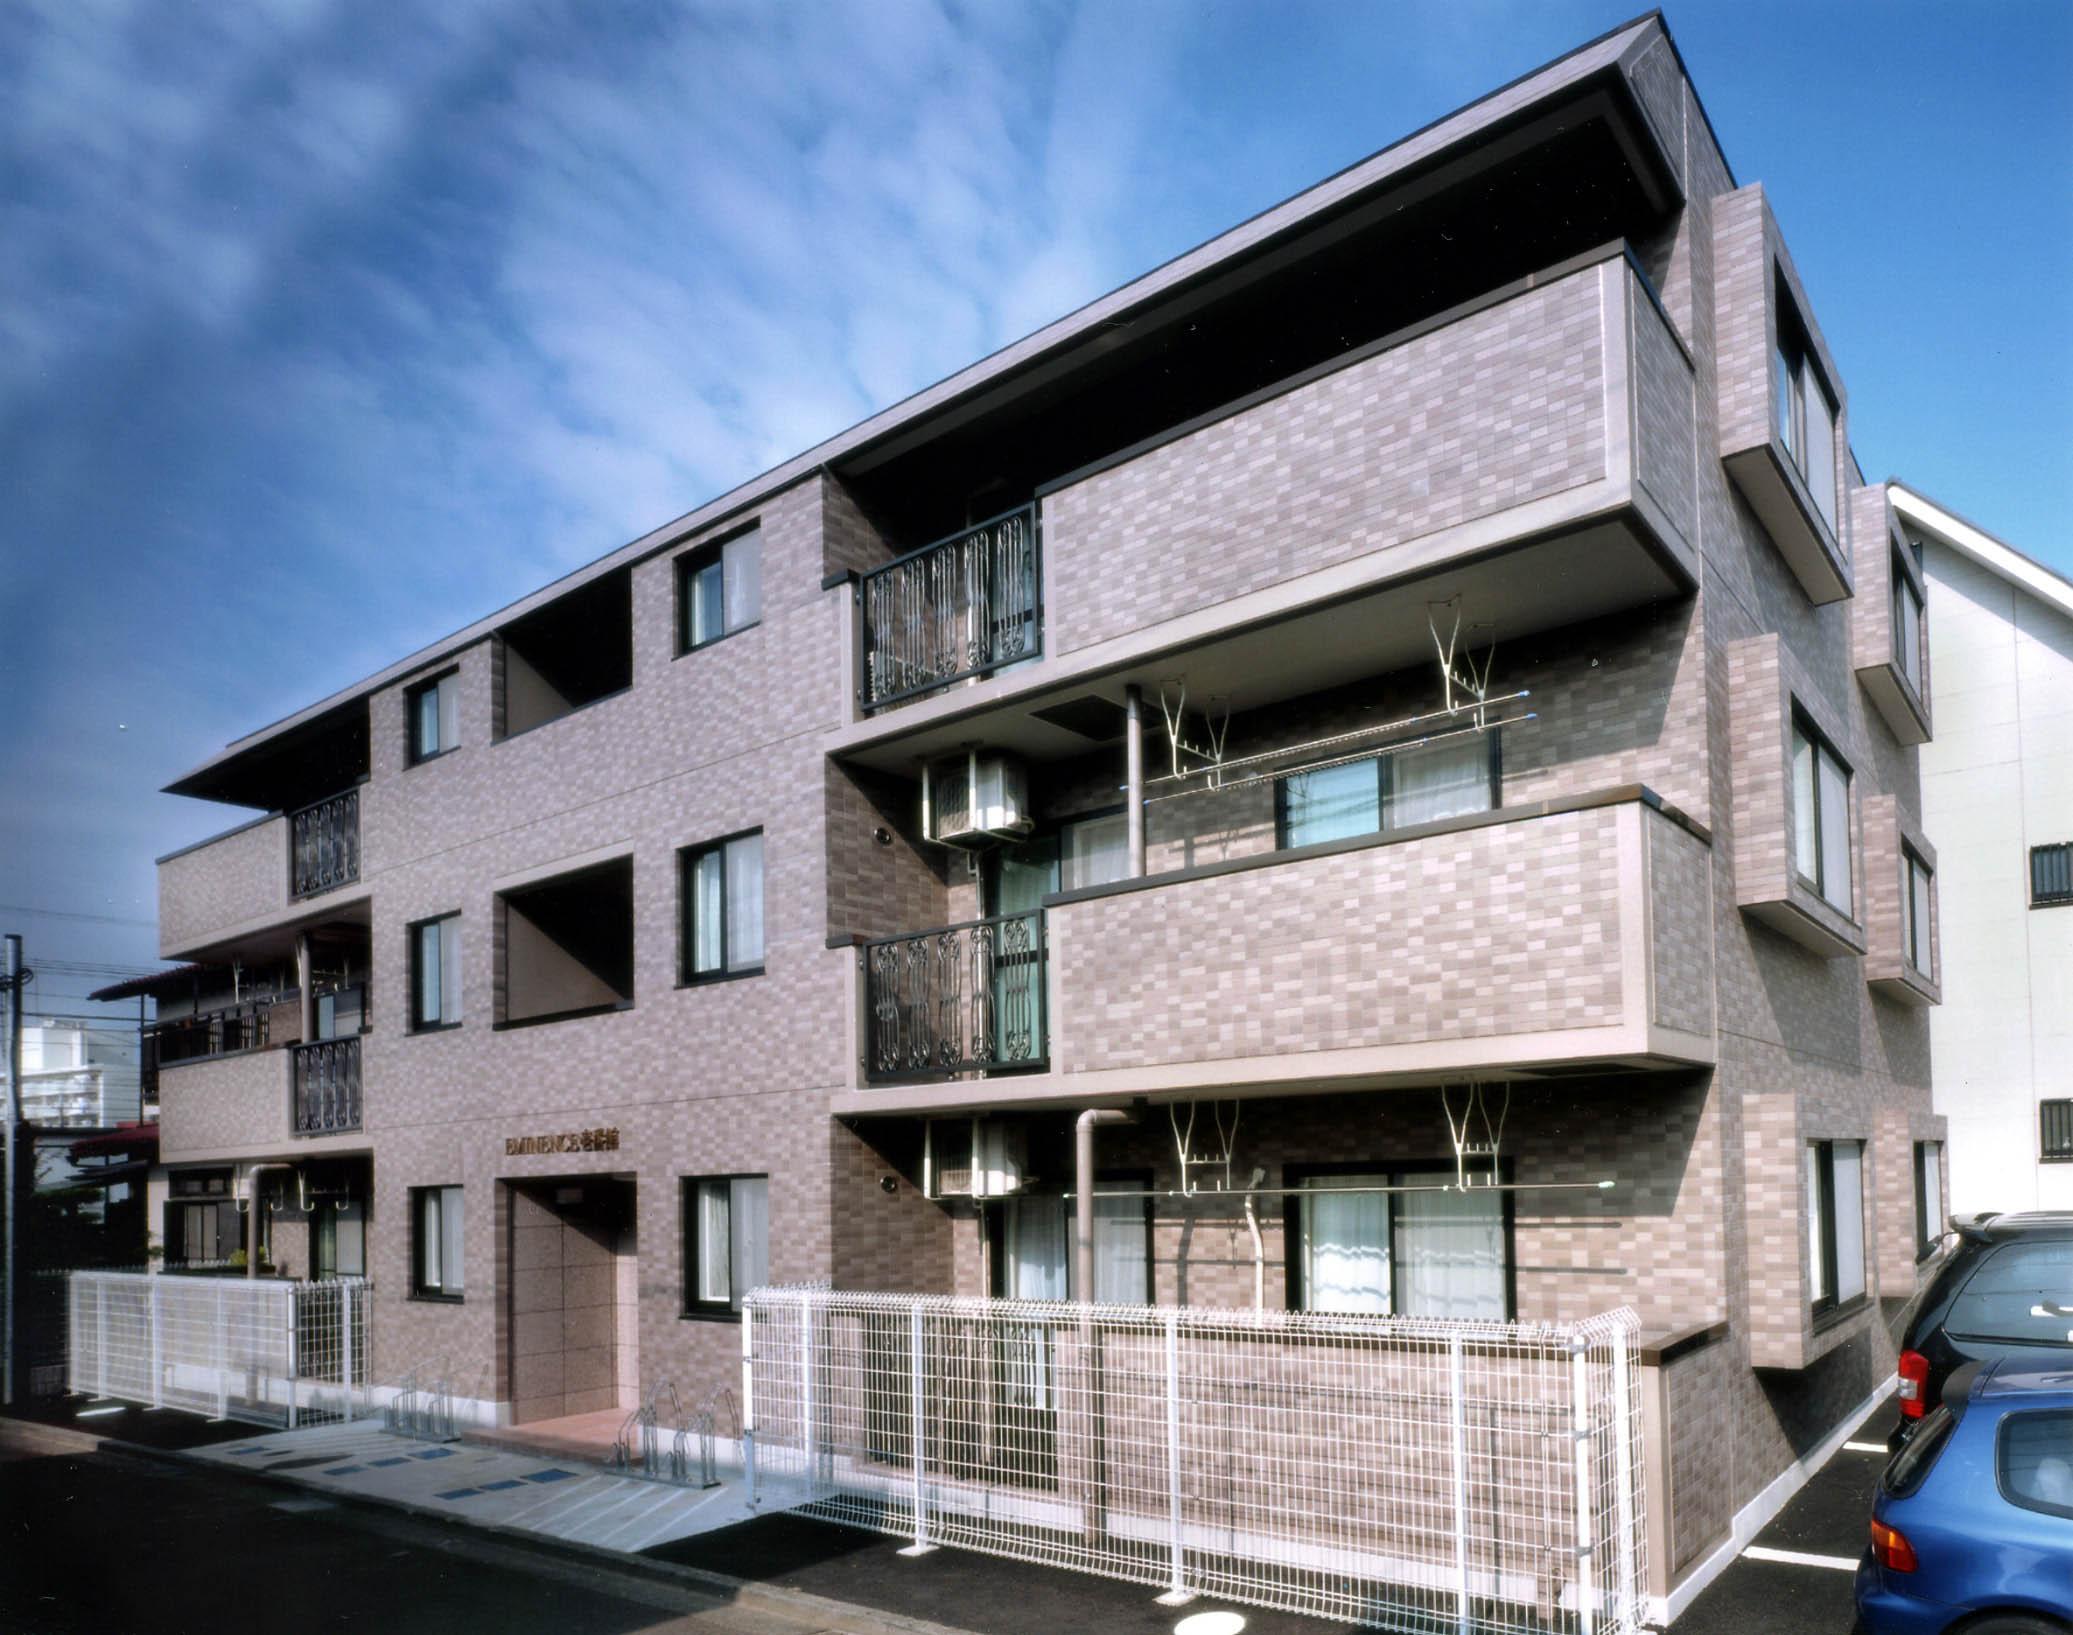 EMINENCE壱番館(エミネンス壱番館)<br /> 2001年6月竣工<br /> 3階・3LDK(6戸)